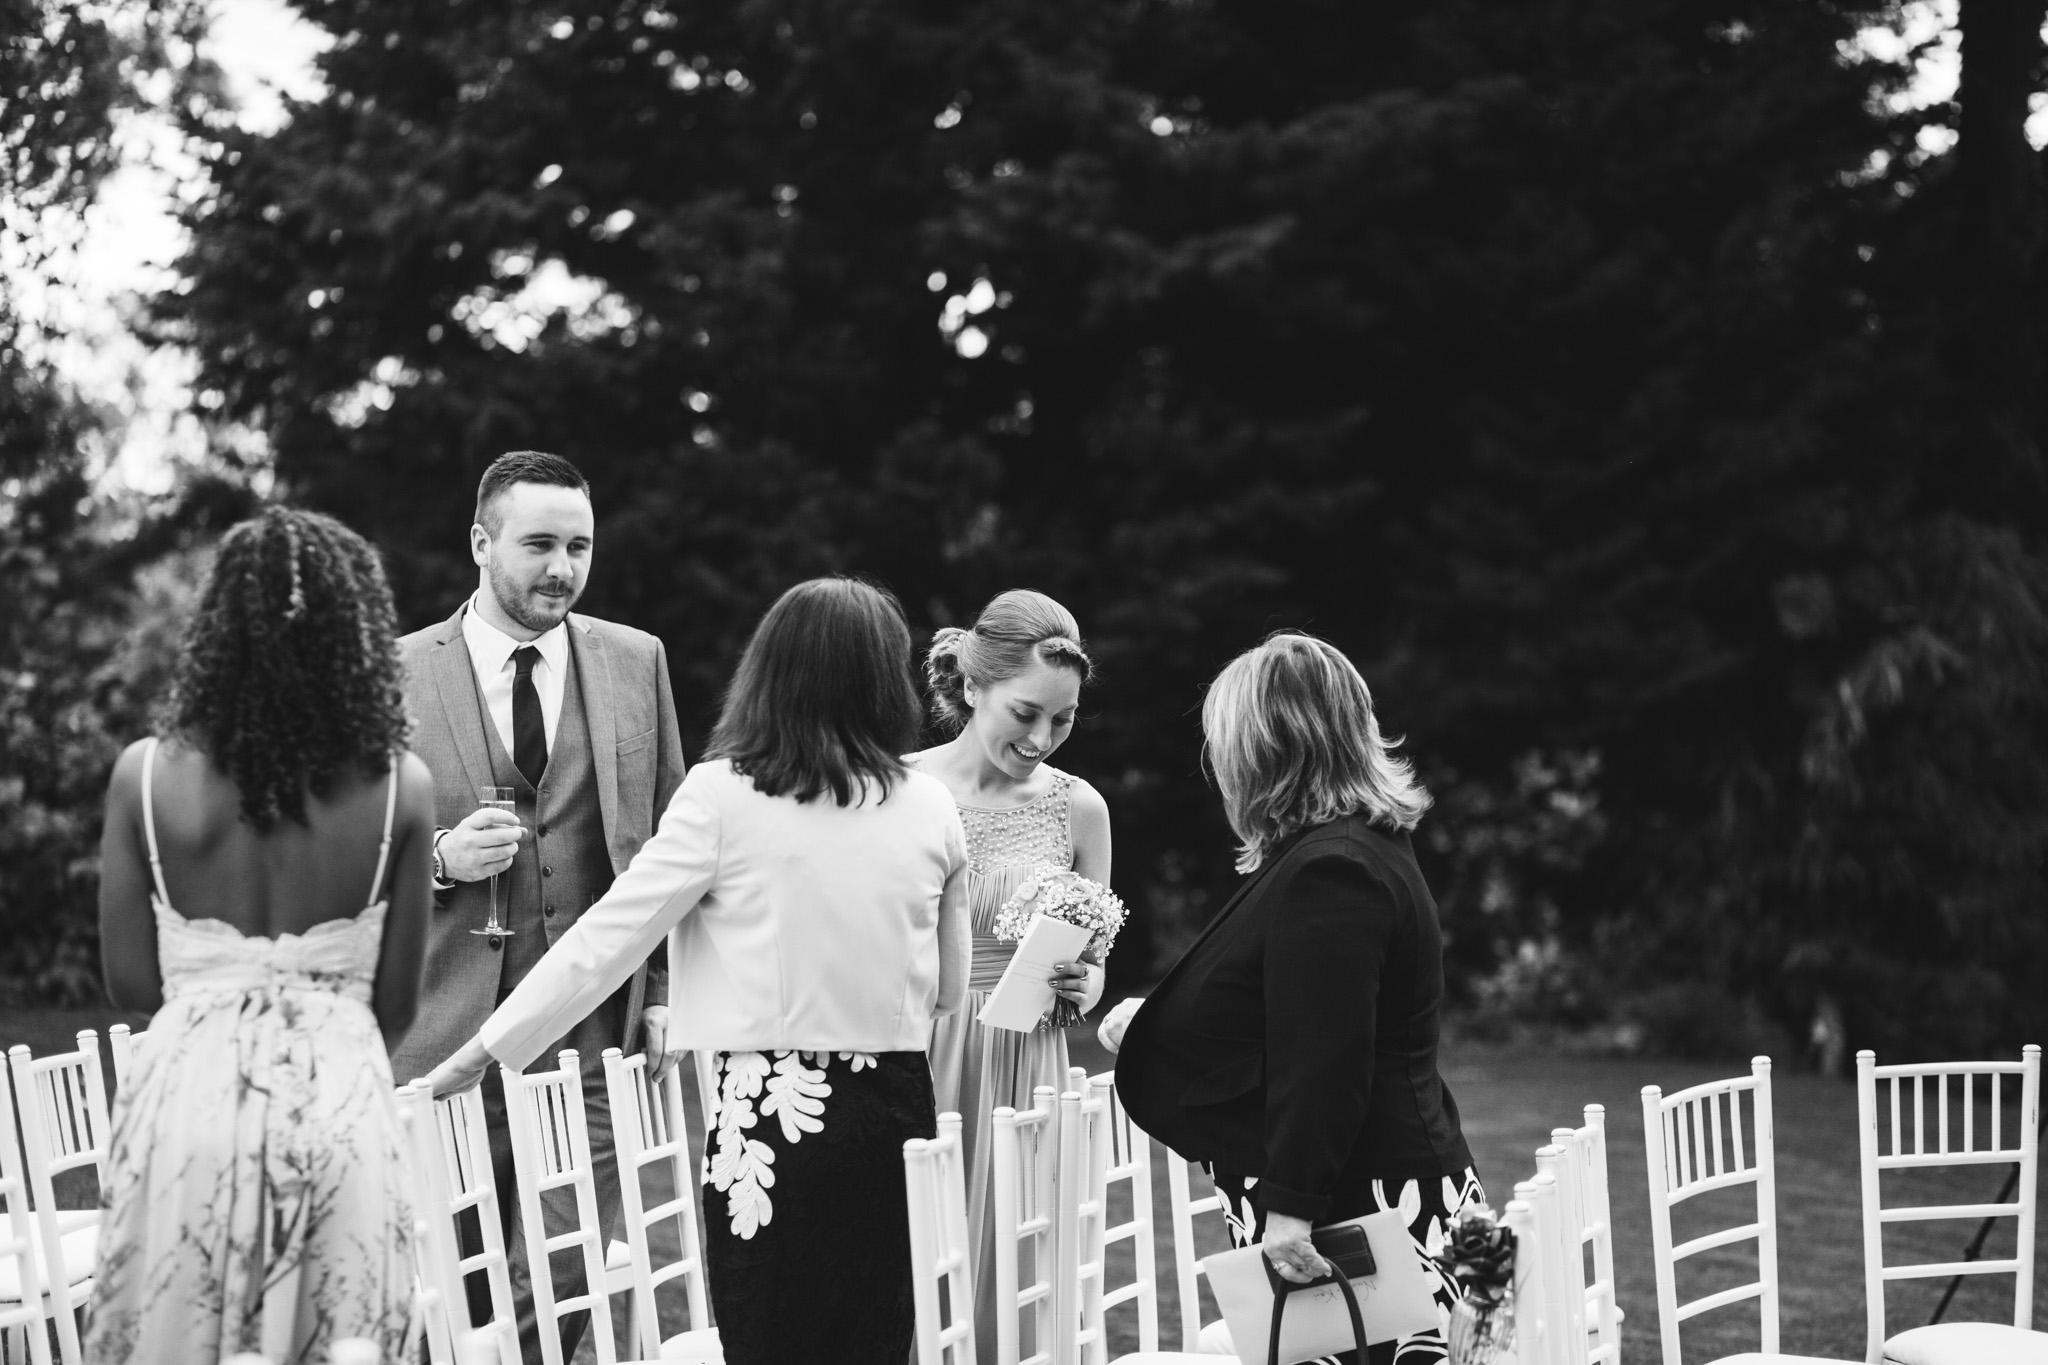 cat-lane-weddings__sheene-mill-wedding-photography__clw__1444__38A7804.jpg